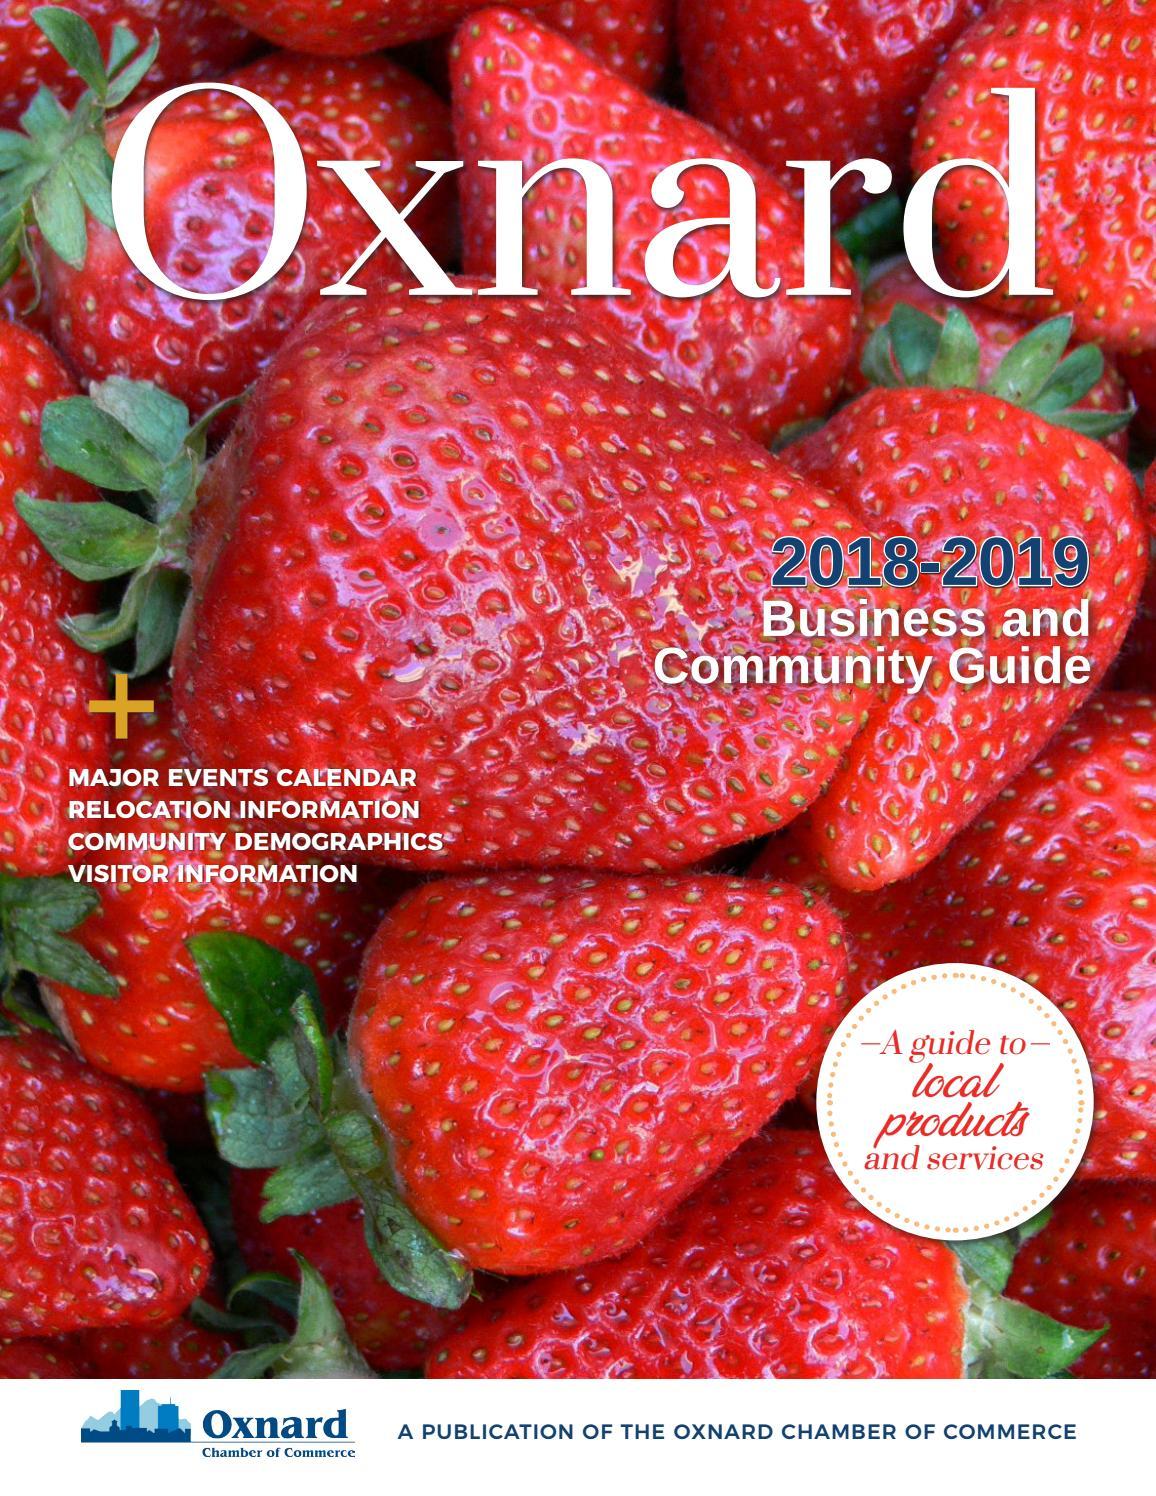 Strawberry Festival 2020 Oxnard.2018 2019 Oxnard Chamber Community Business Guide By